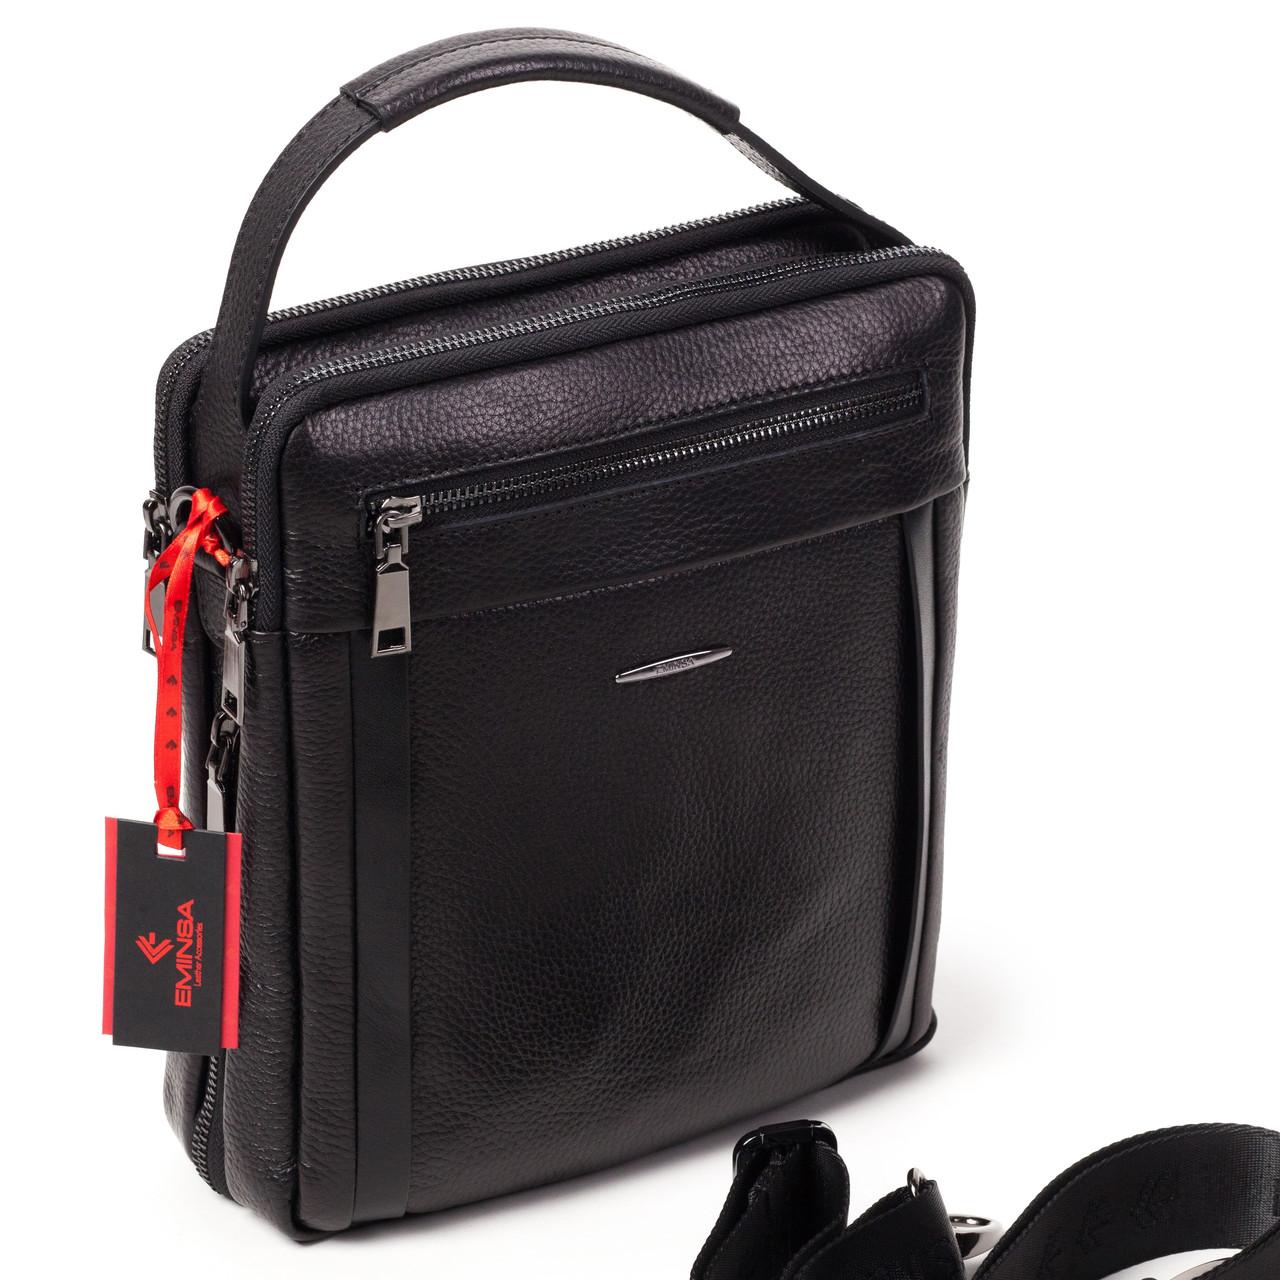 Мужская сумка кожаная черная Eminsa 6135-37-1